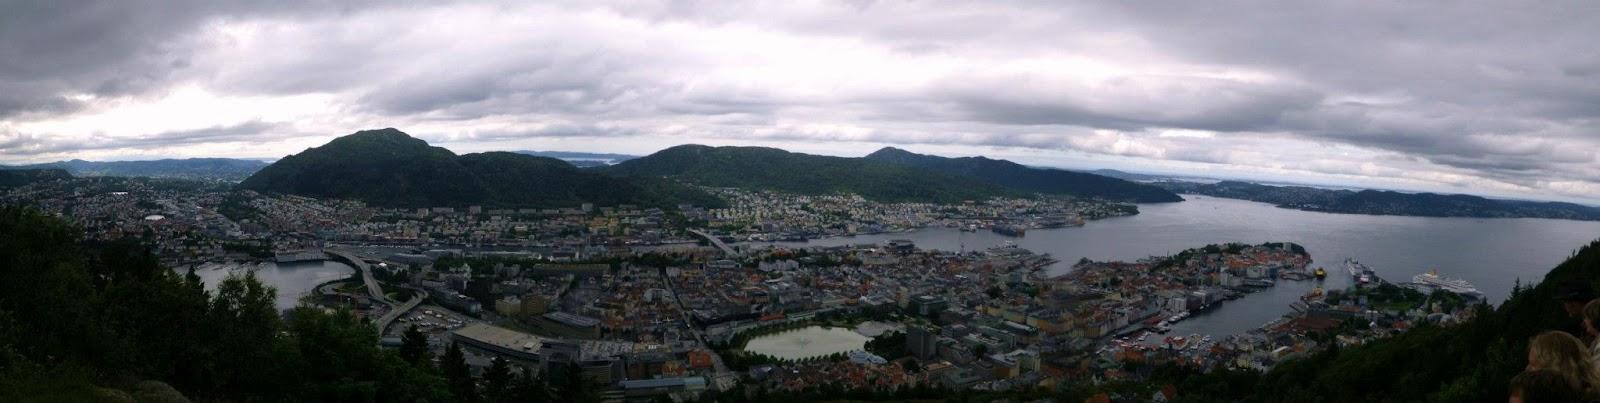 sommerferie i norge Jørpeland